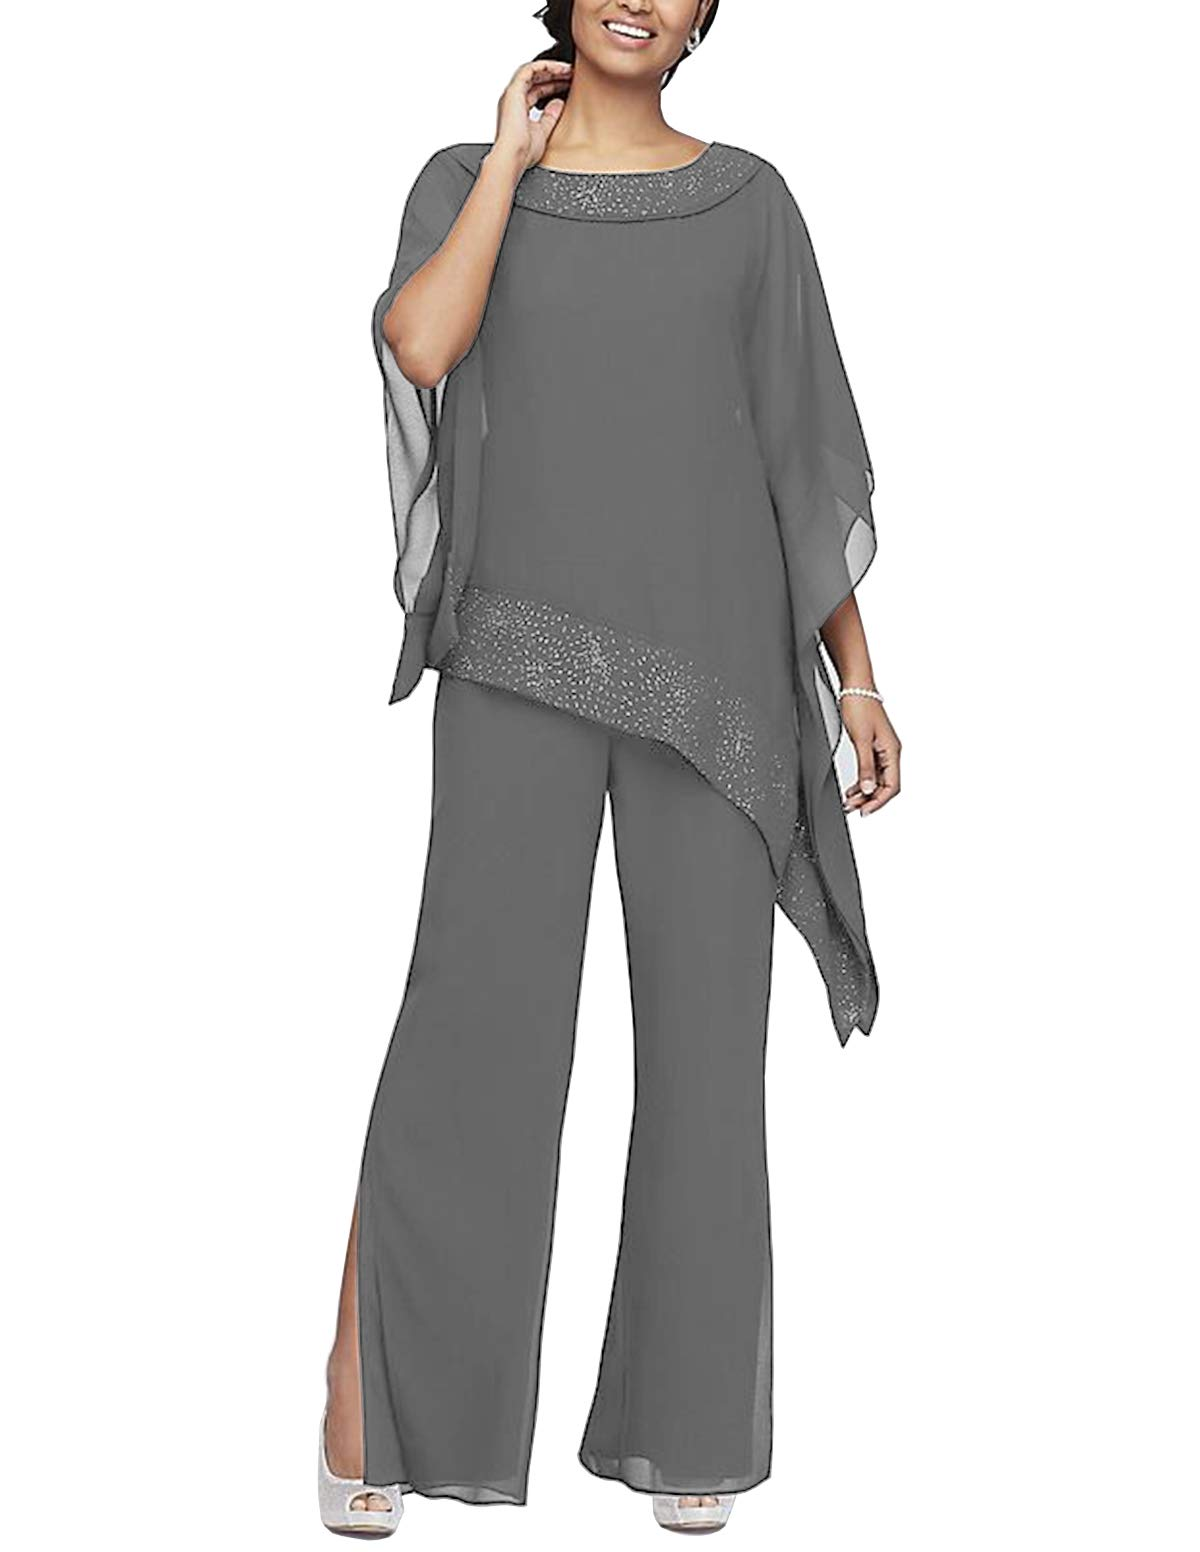 Women\'s Elegant Chiffon 3 Pieces Pant Suits Set Mother of The Bride Dresses  with Outfit Wedding Party Plus Size(Grey,US18 Plus)